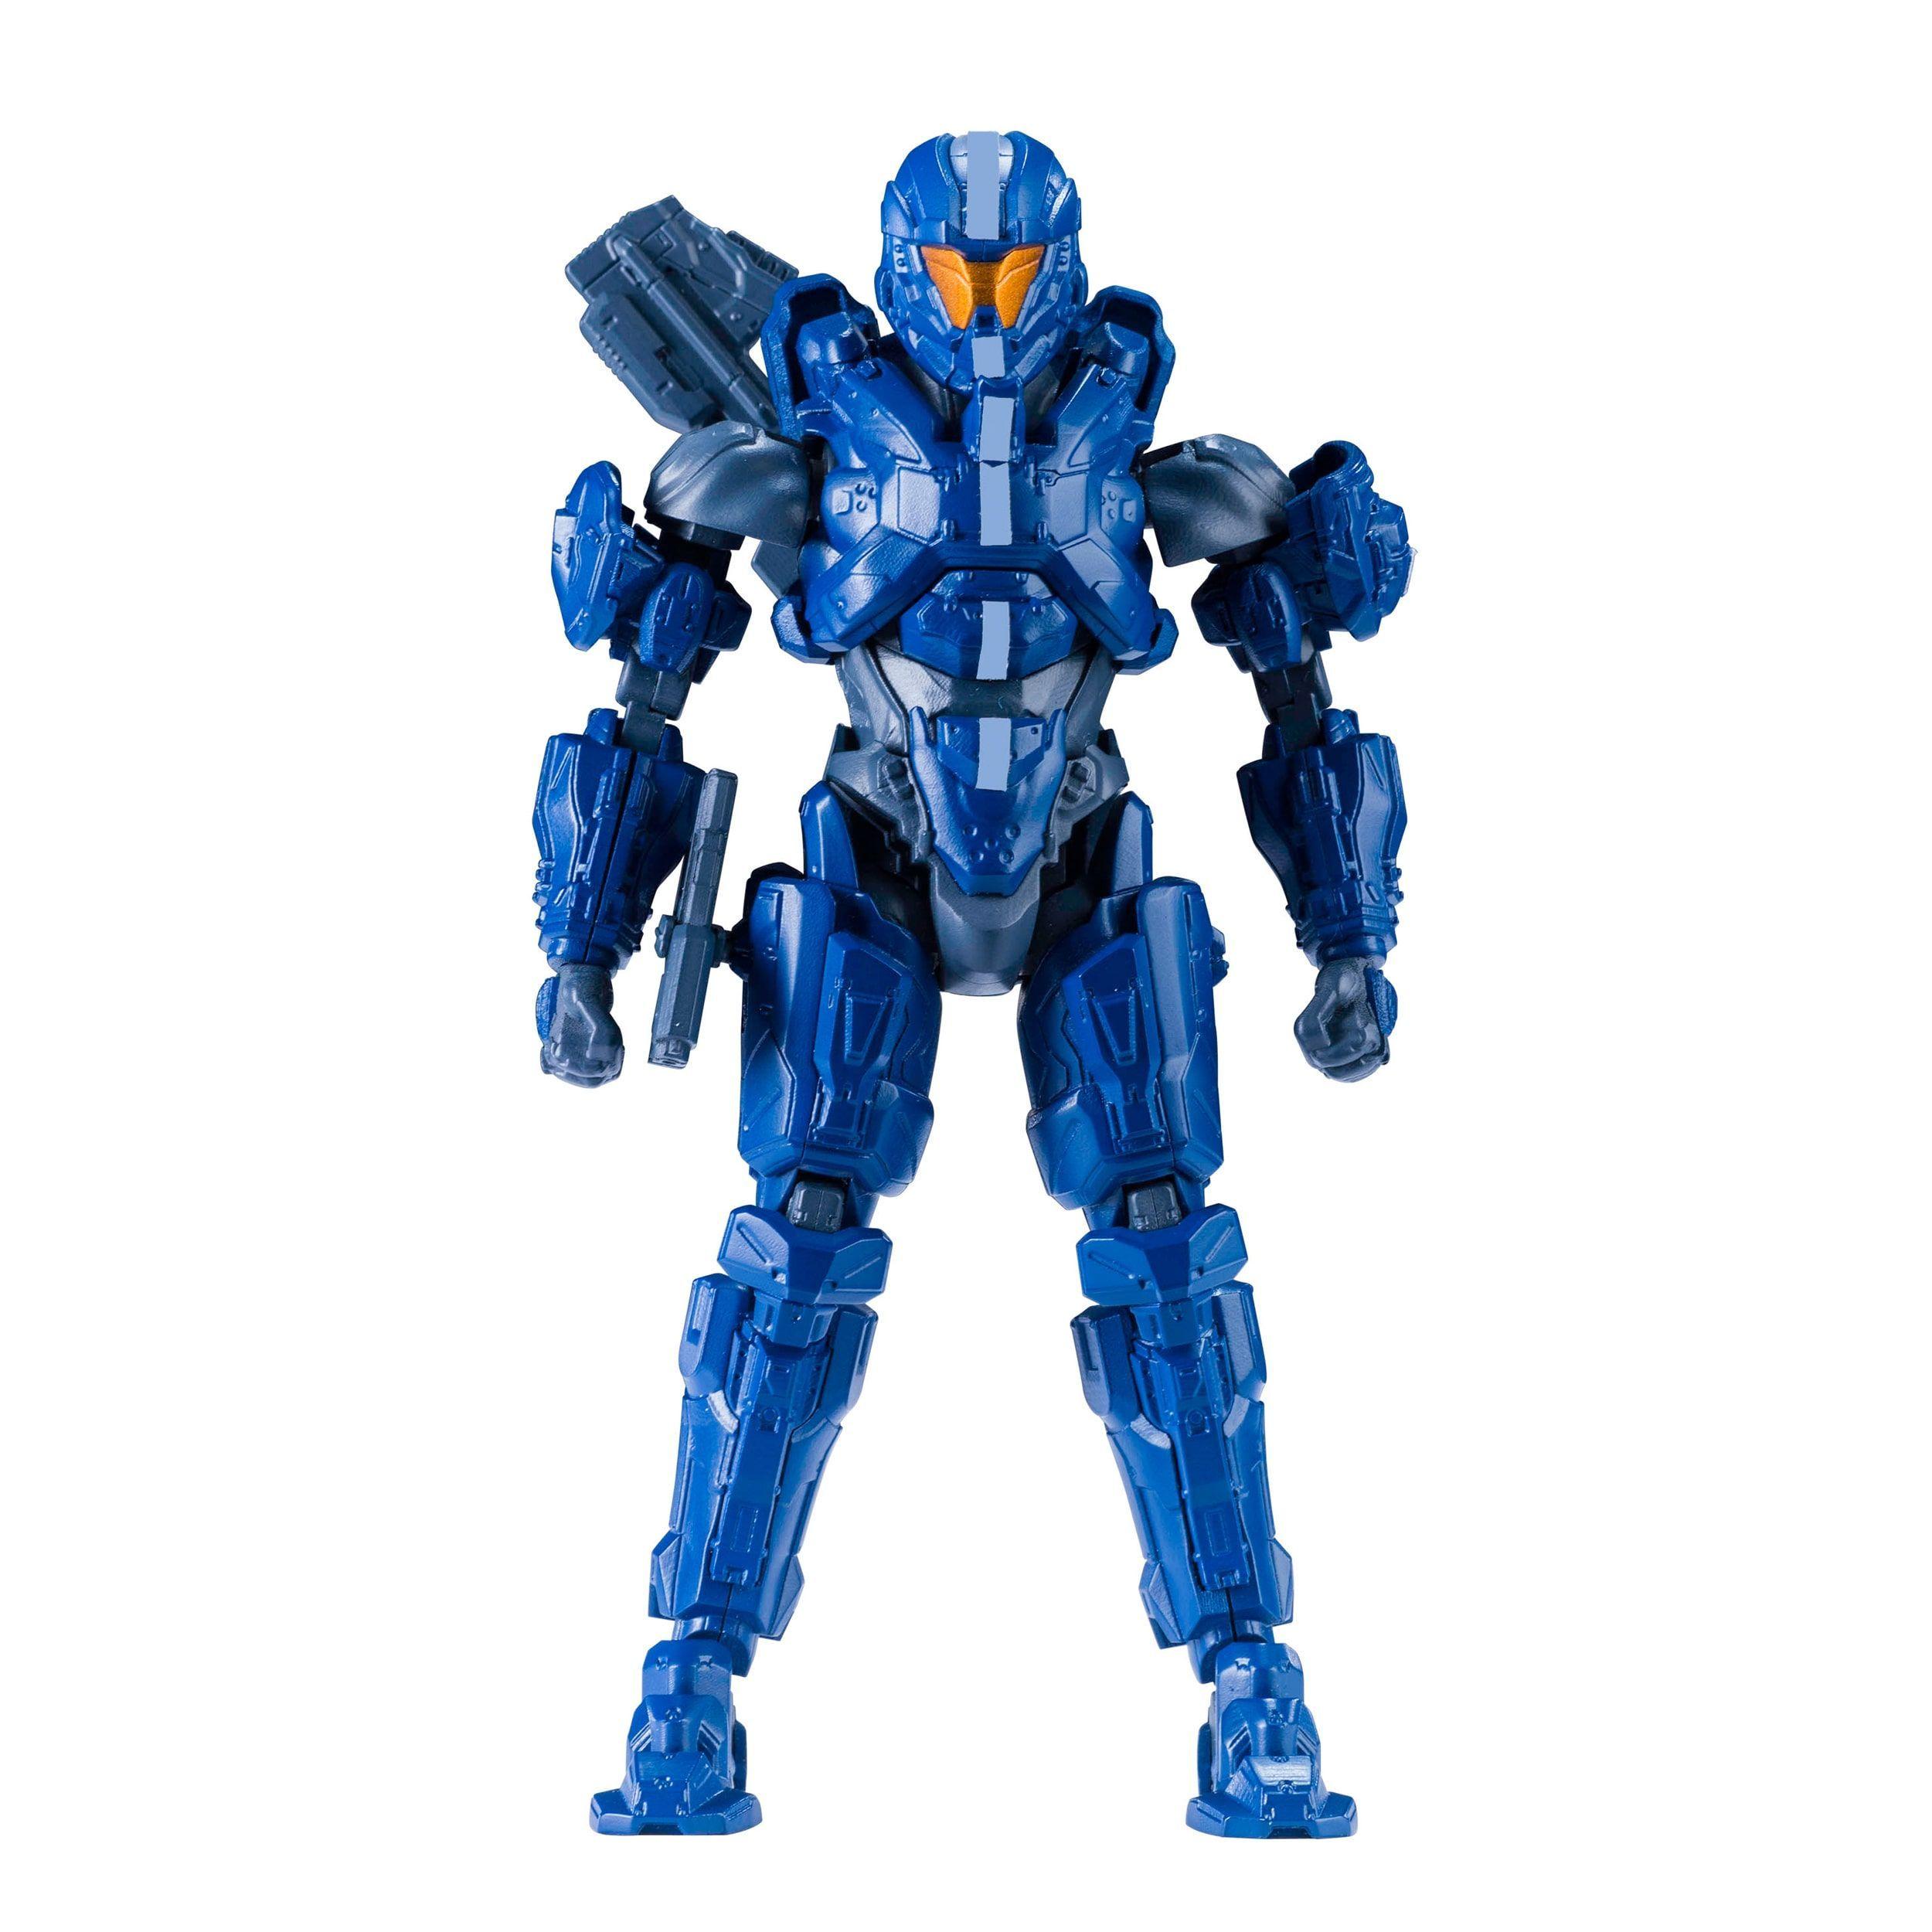 Bandai SpruKits Halo Spartan Gabriel Throne Action Figure